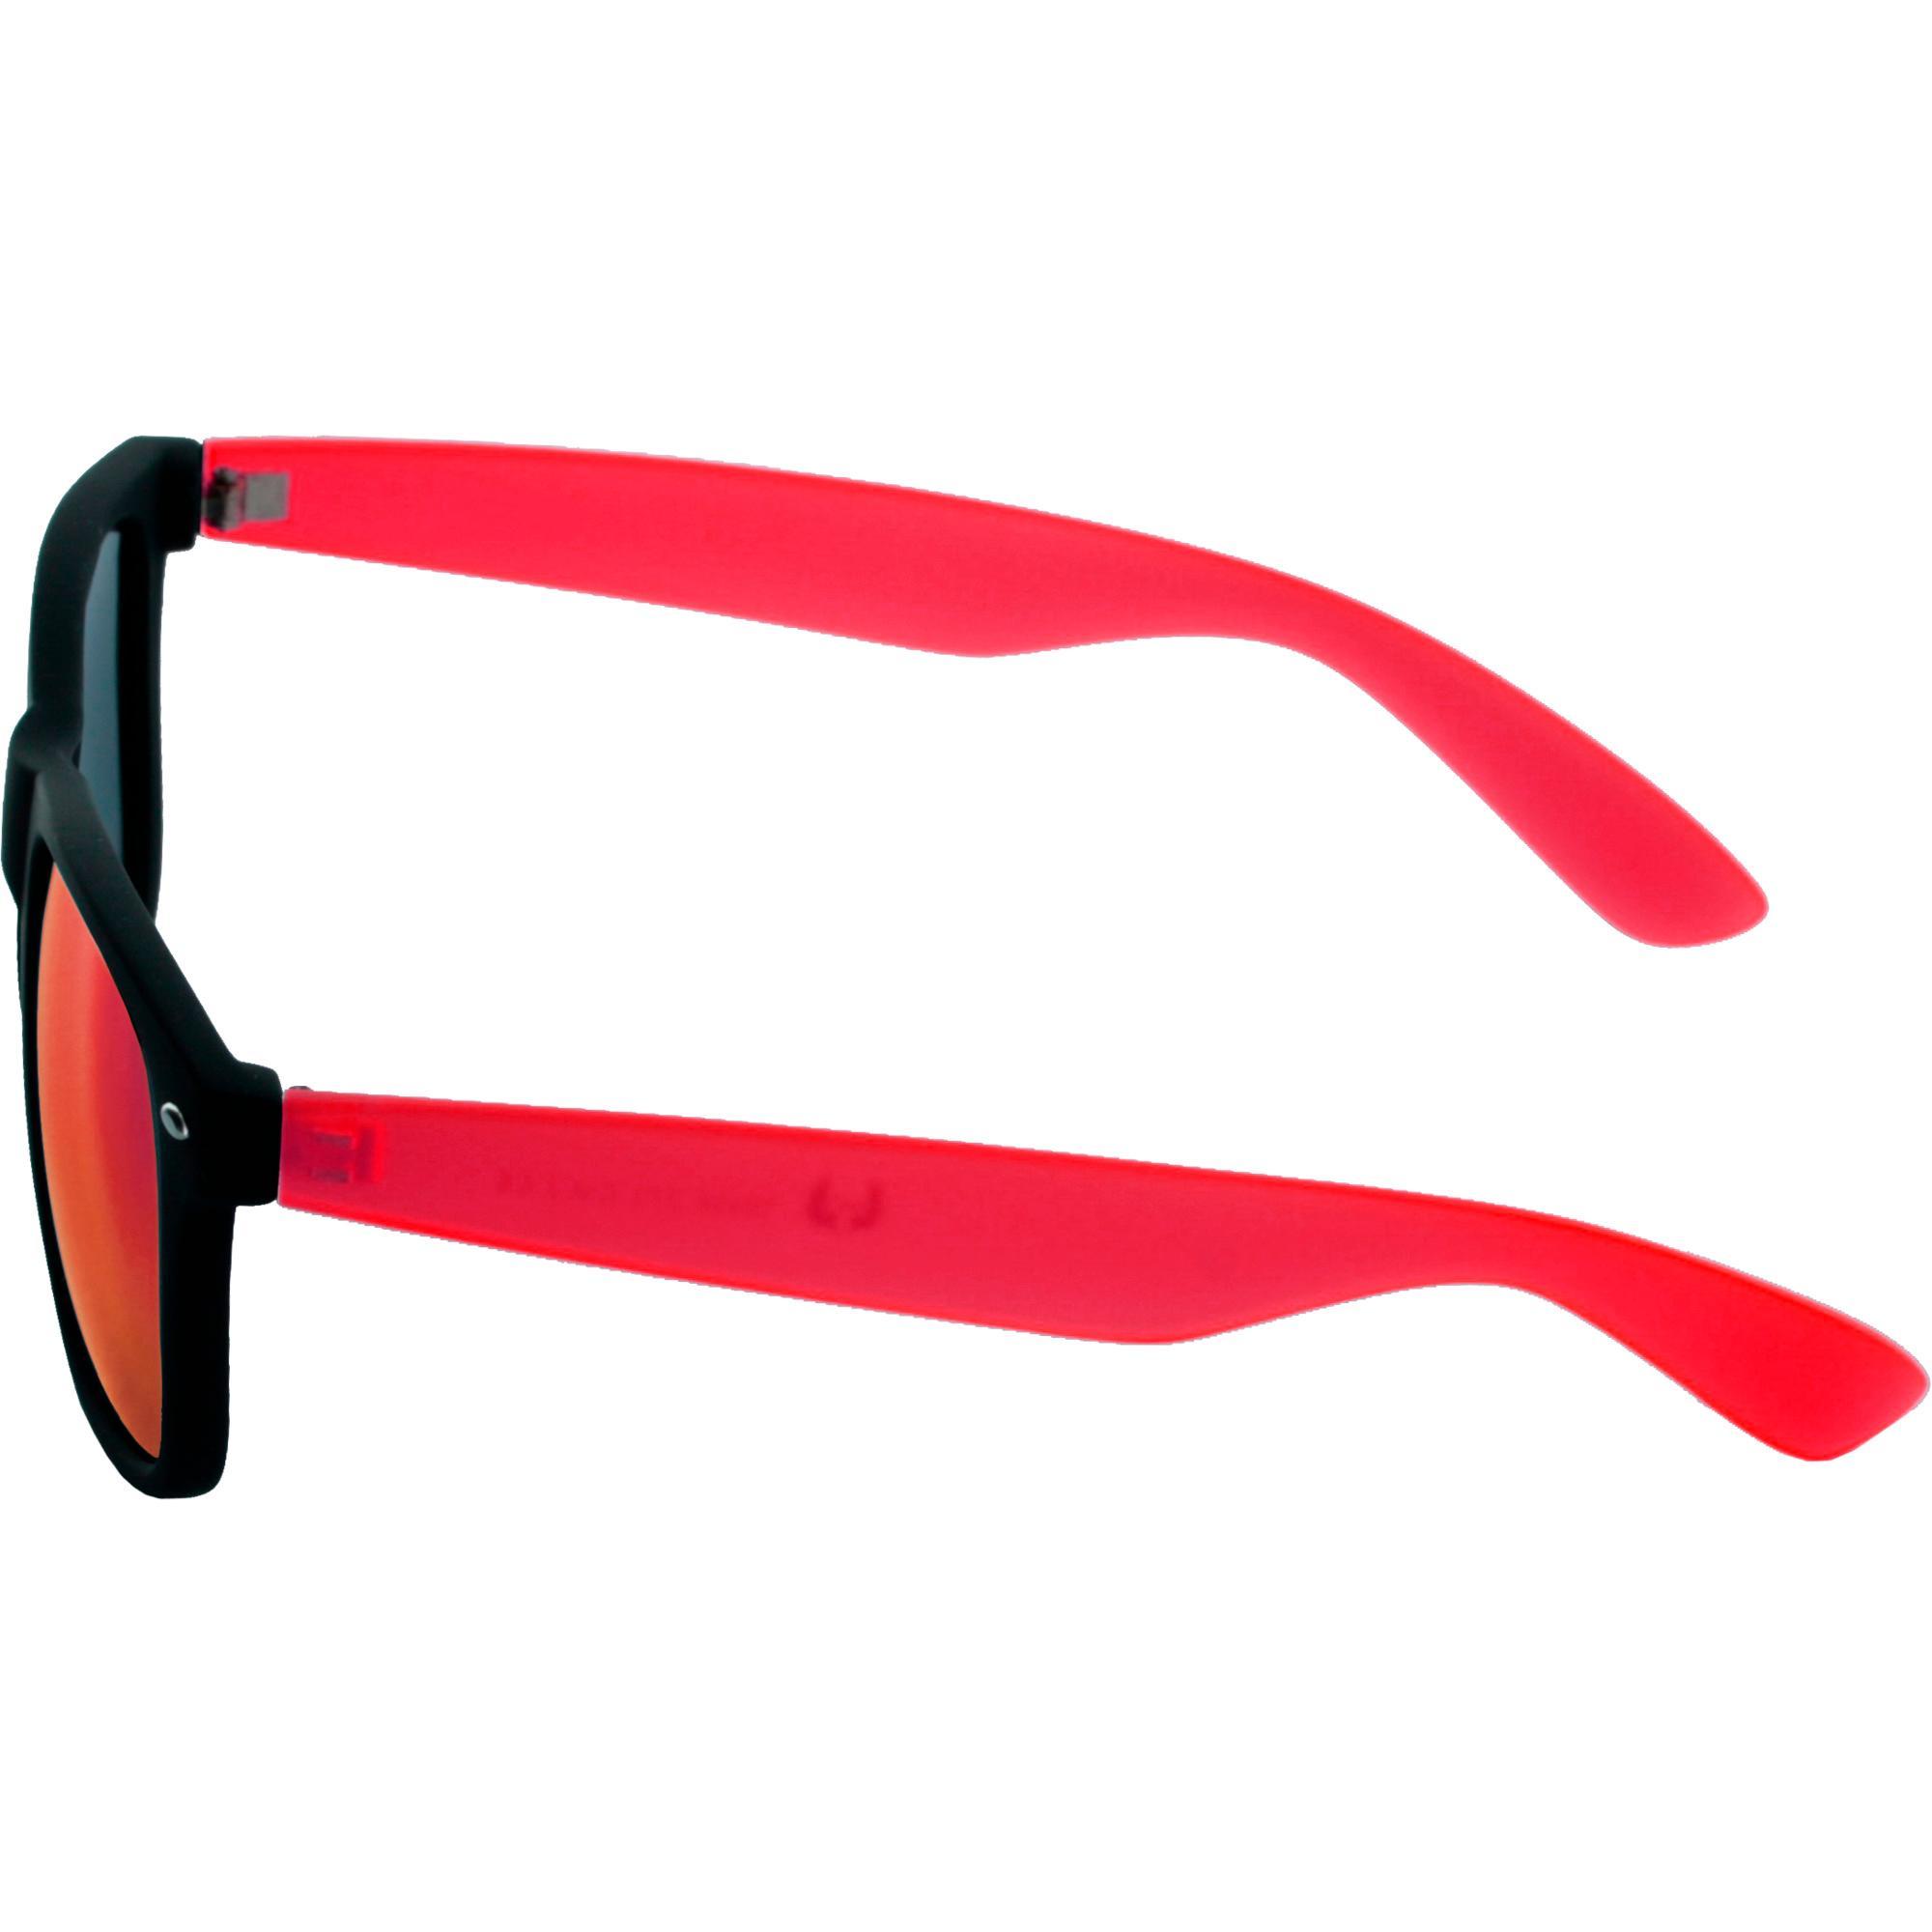 MasterDis Likoma Mirror Sonnenbrillen Sonnenbrille schwarz orange 4I2NGVj